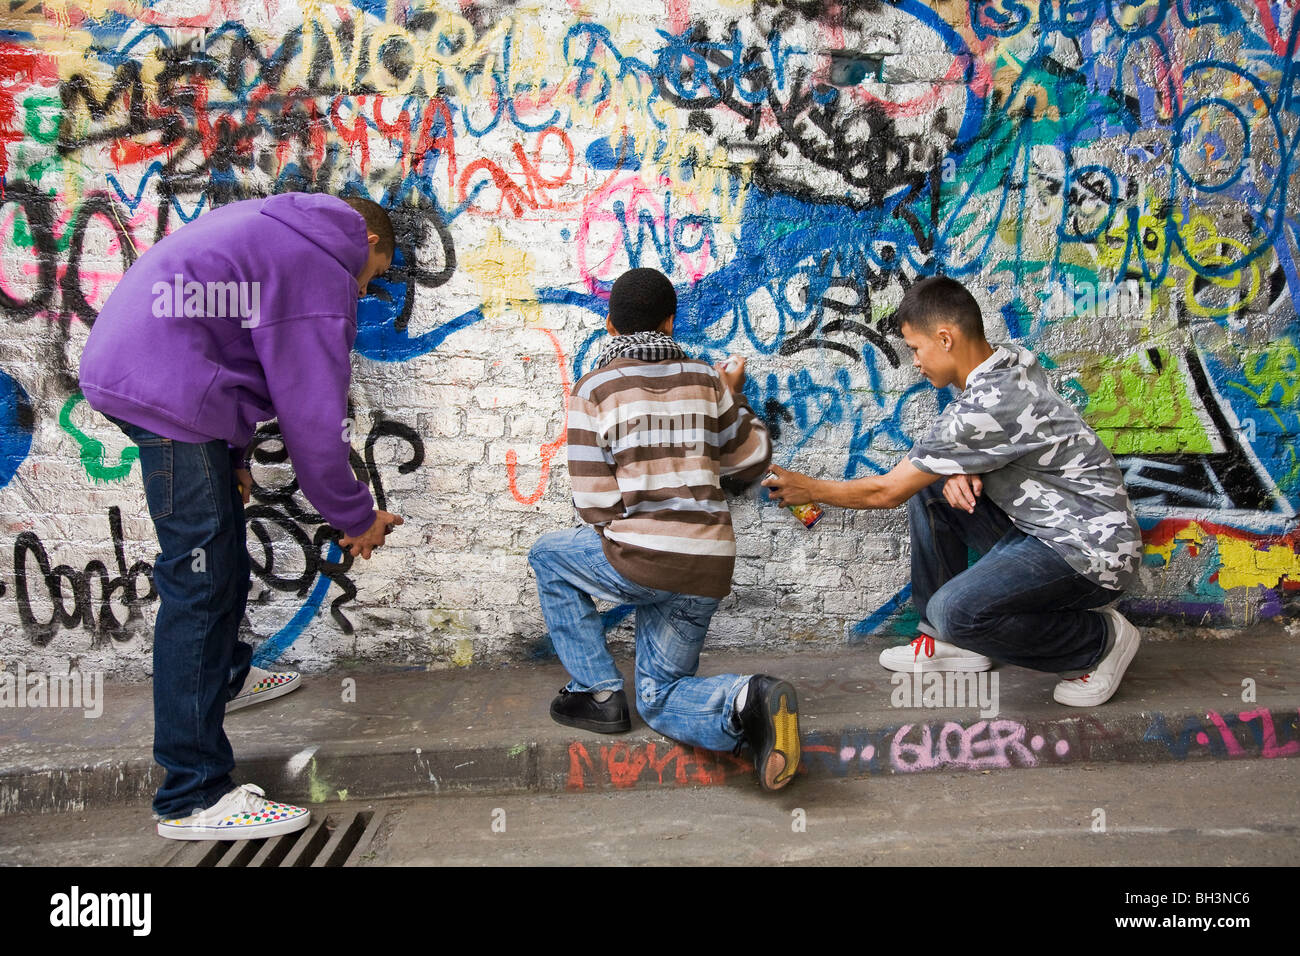 Graffiti wall ann arbor - Teenage Gang Doing Graffiti On A Wall Stock Image